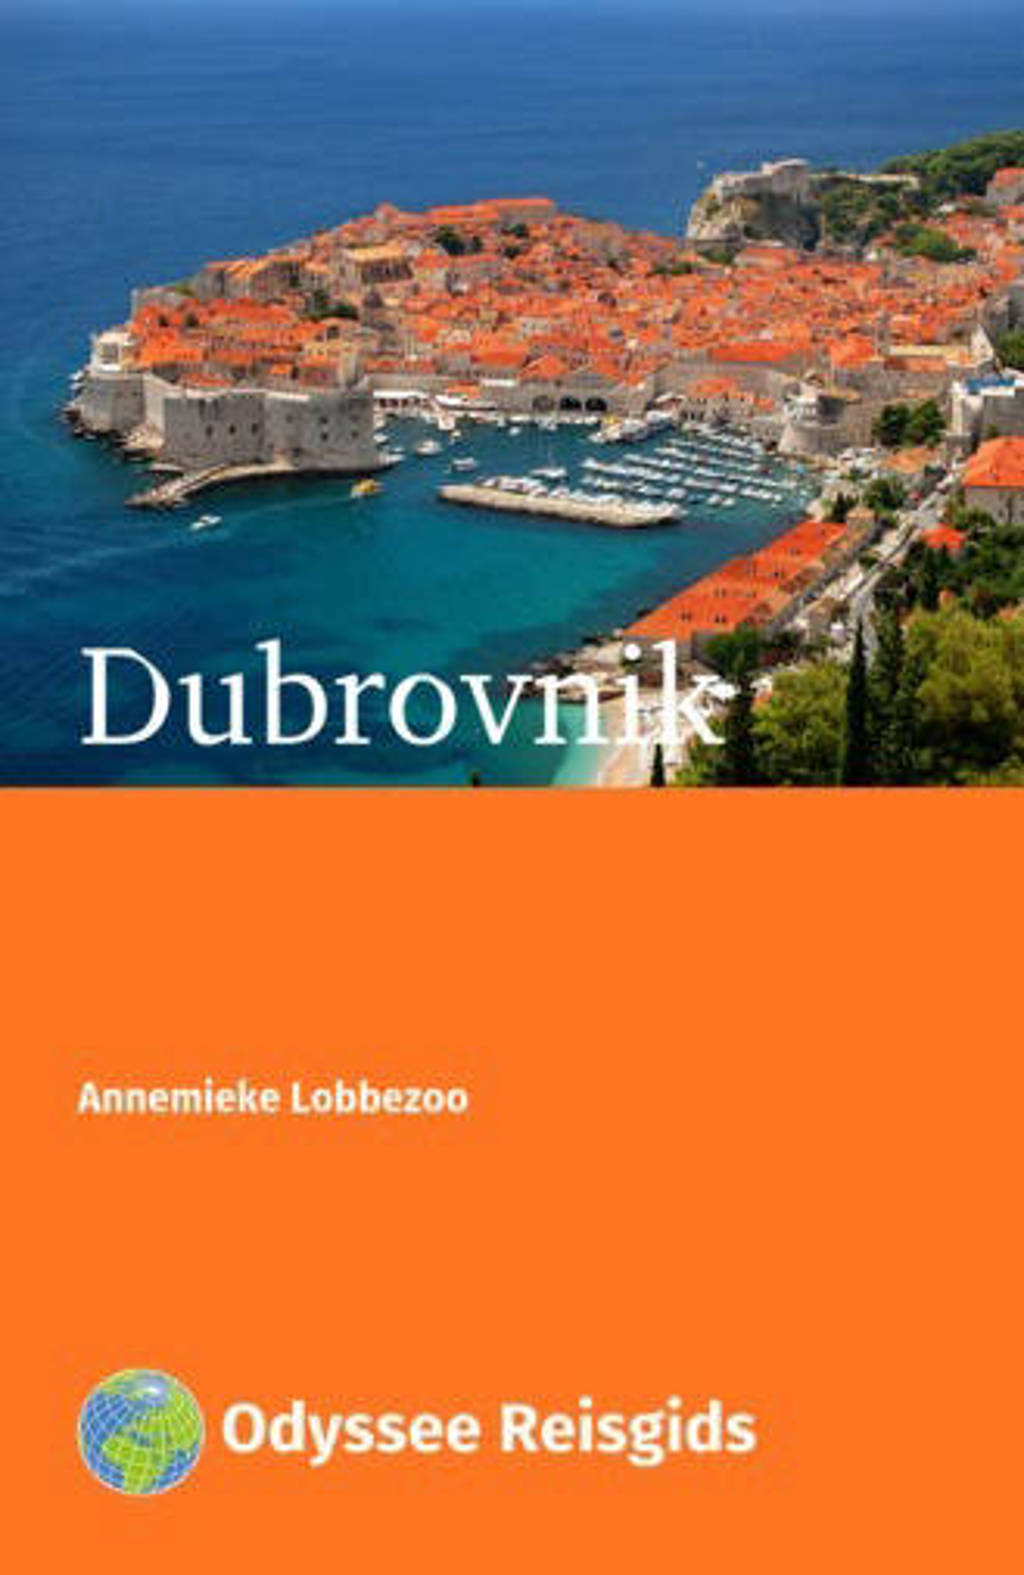 Dubrovnik - Annemieke Lobbezoo